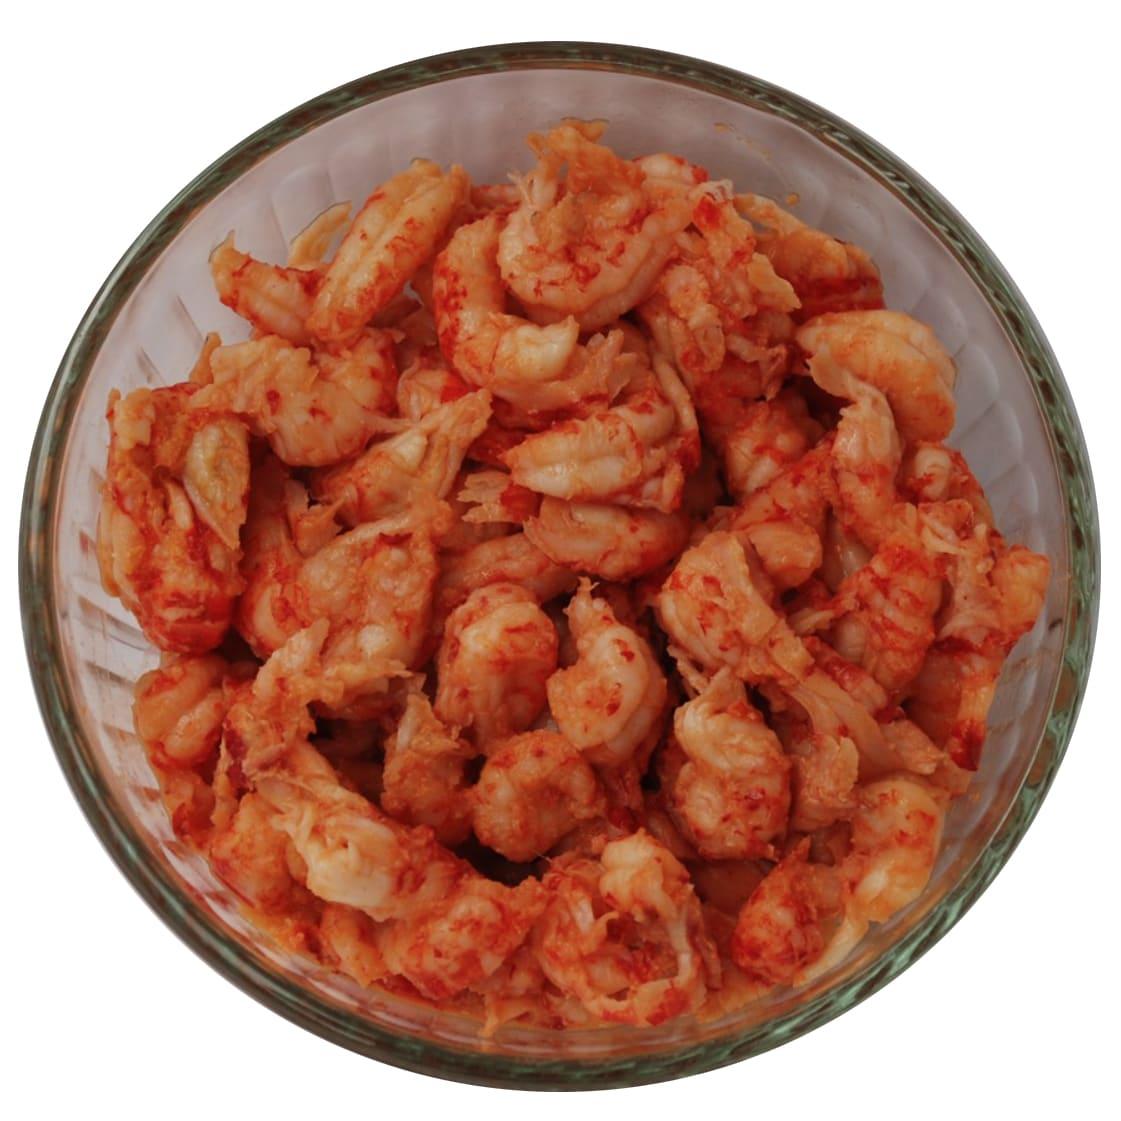 Louisiana Crawfish Tail Meat (10 lbs.)